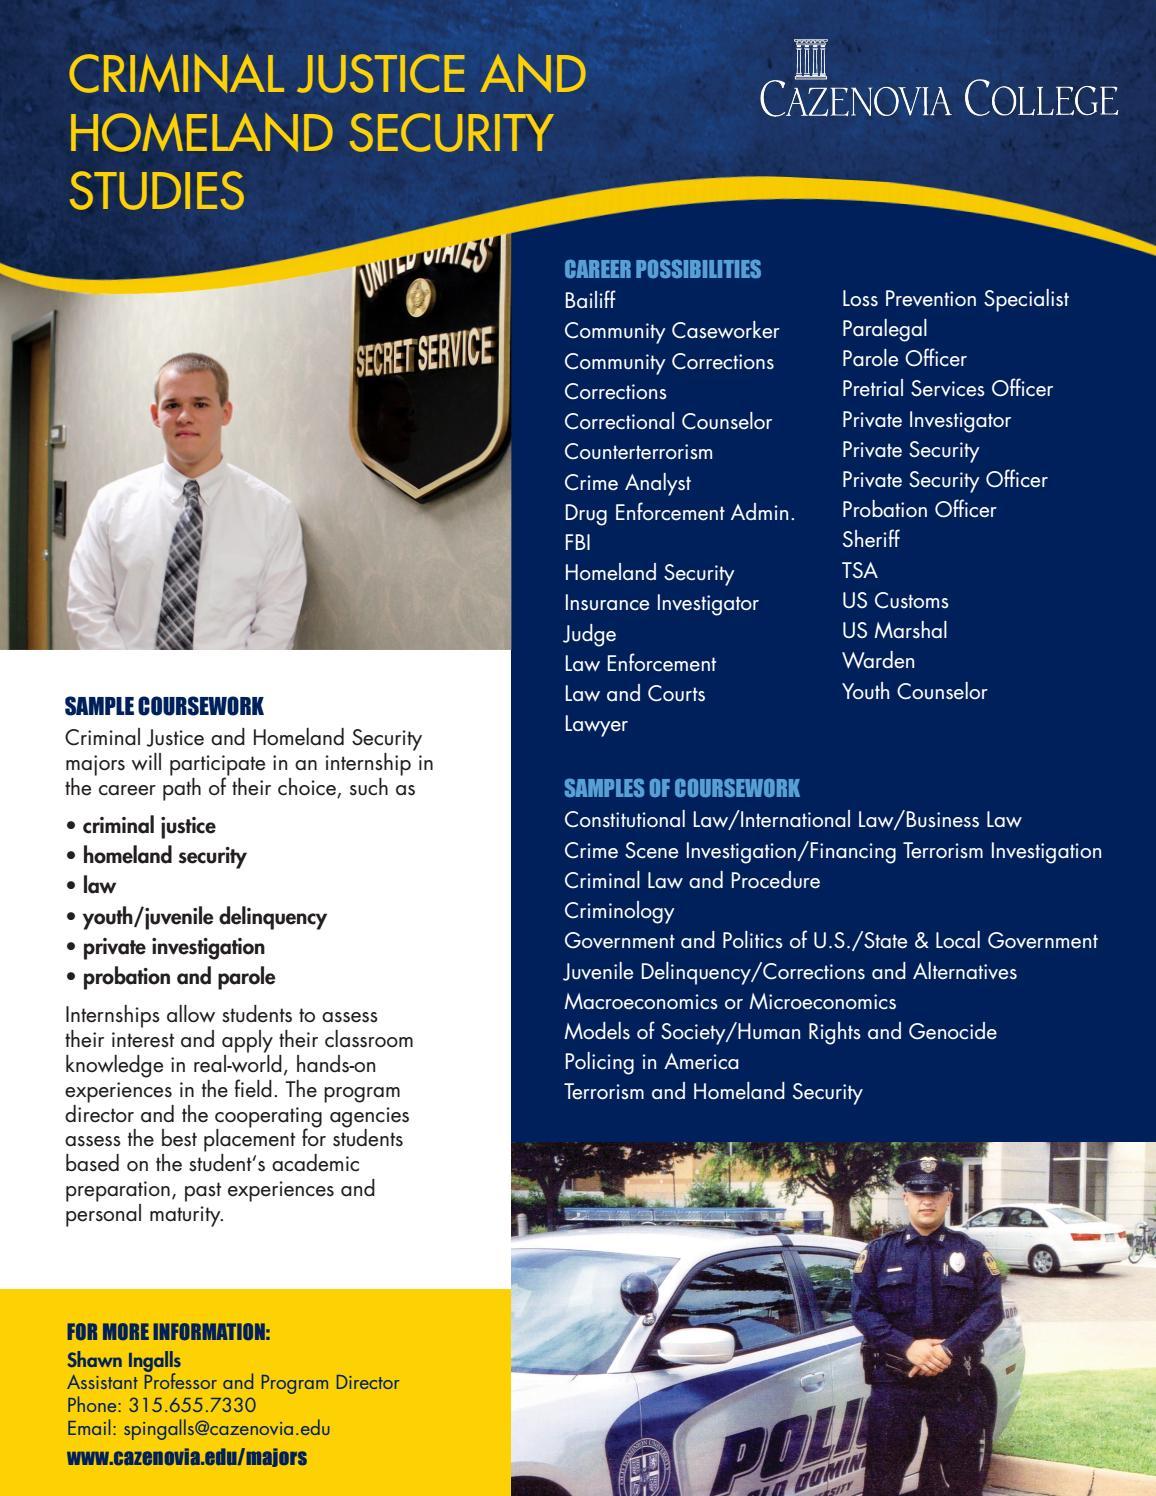 Criminal Justice And Homeland Security Studies Brochure